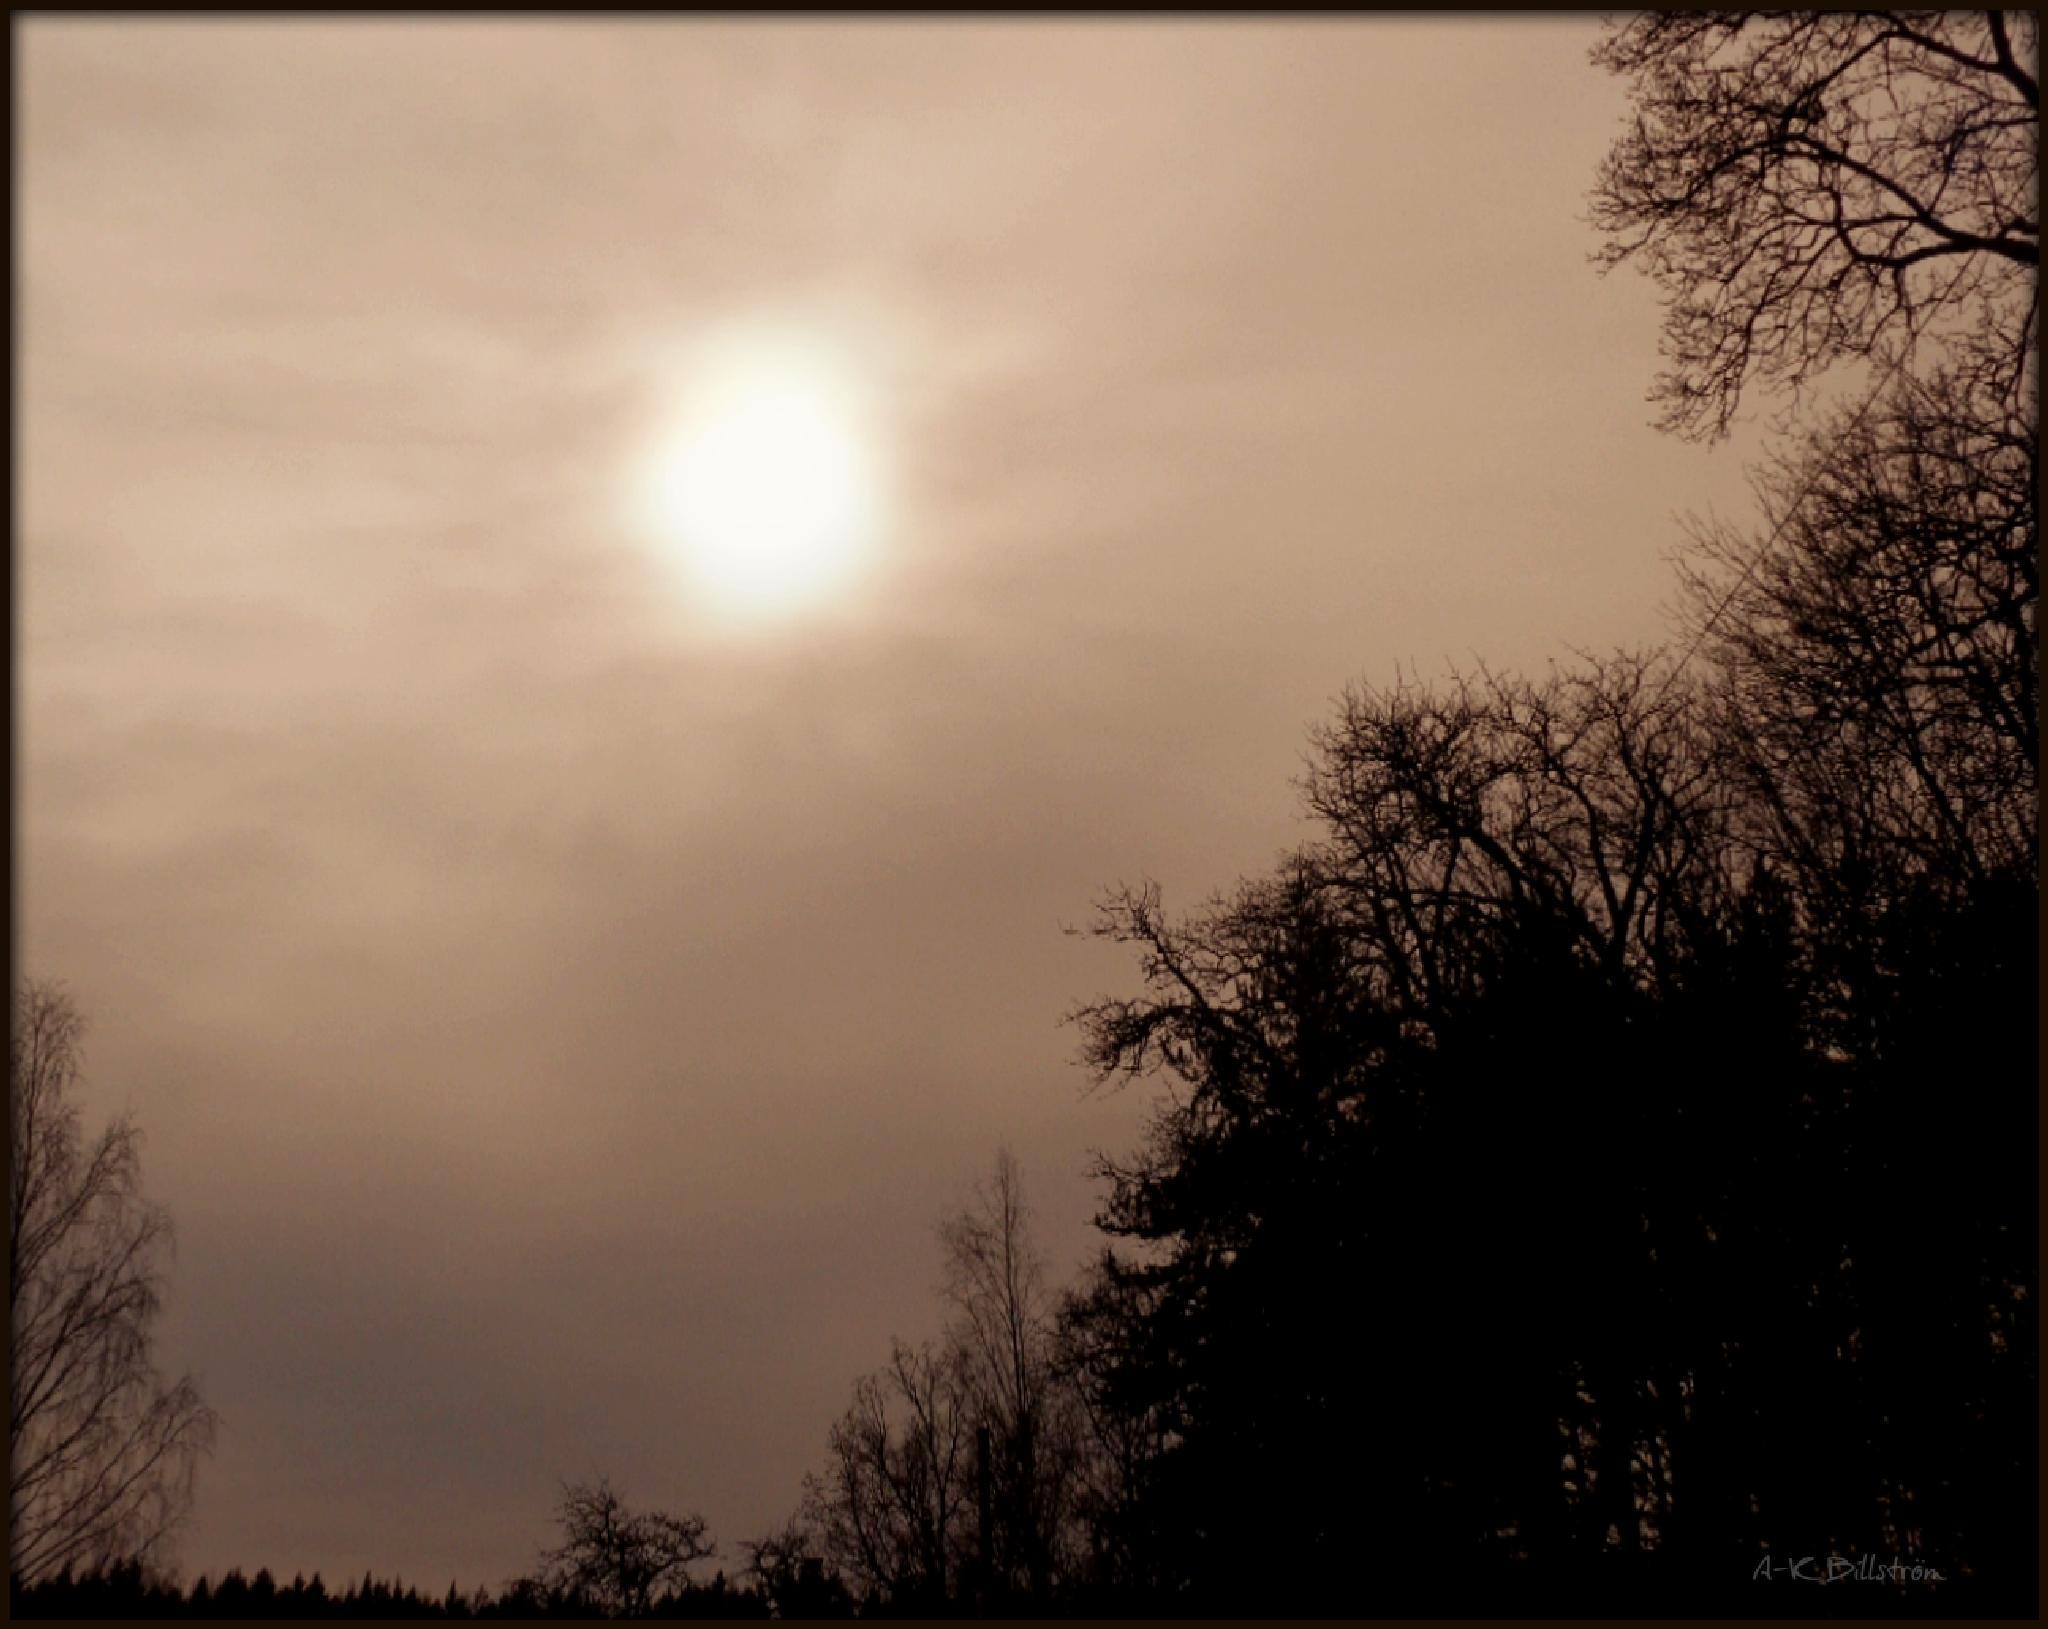 Looking into the sun by A-K Billström